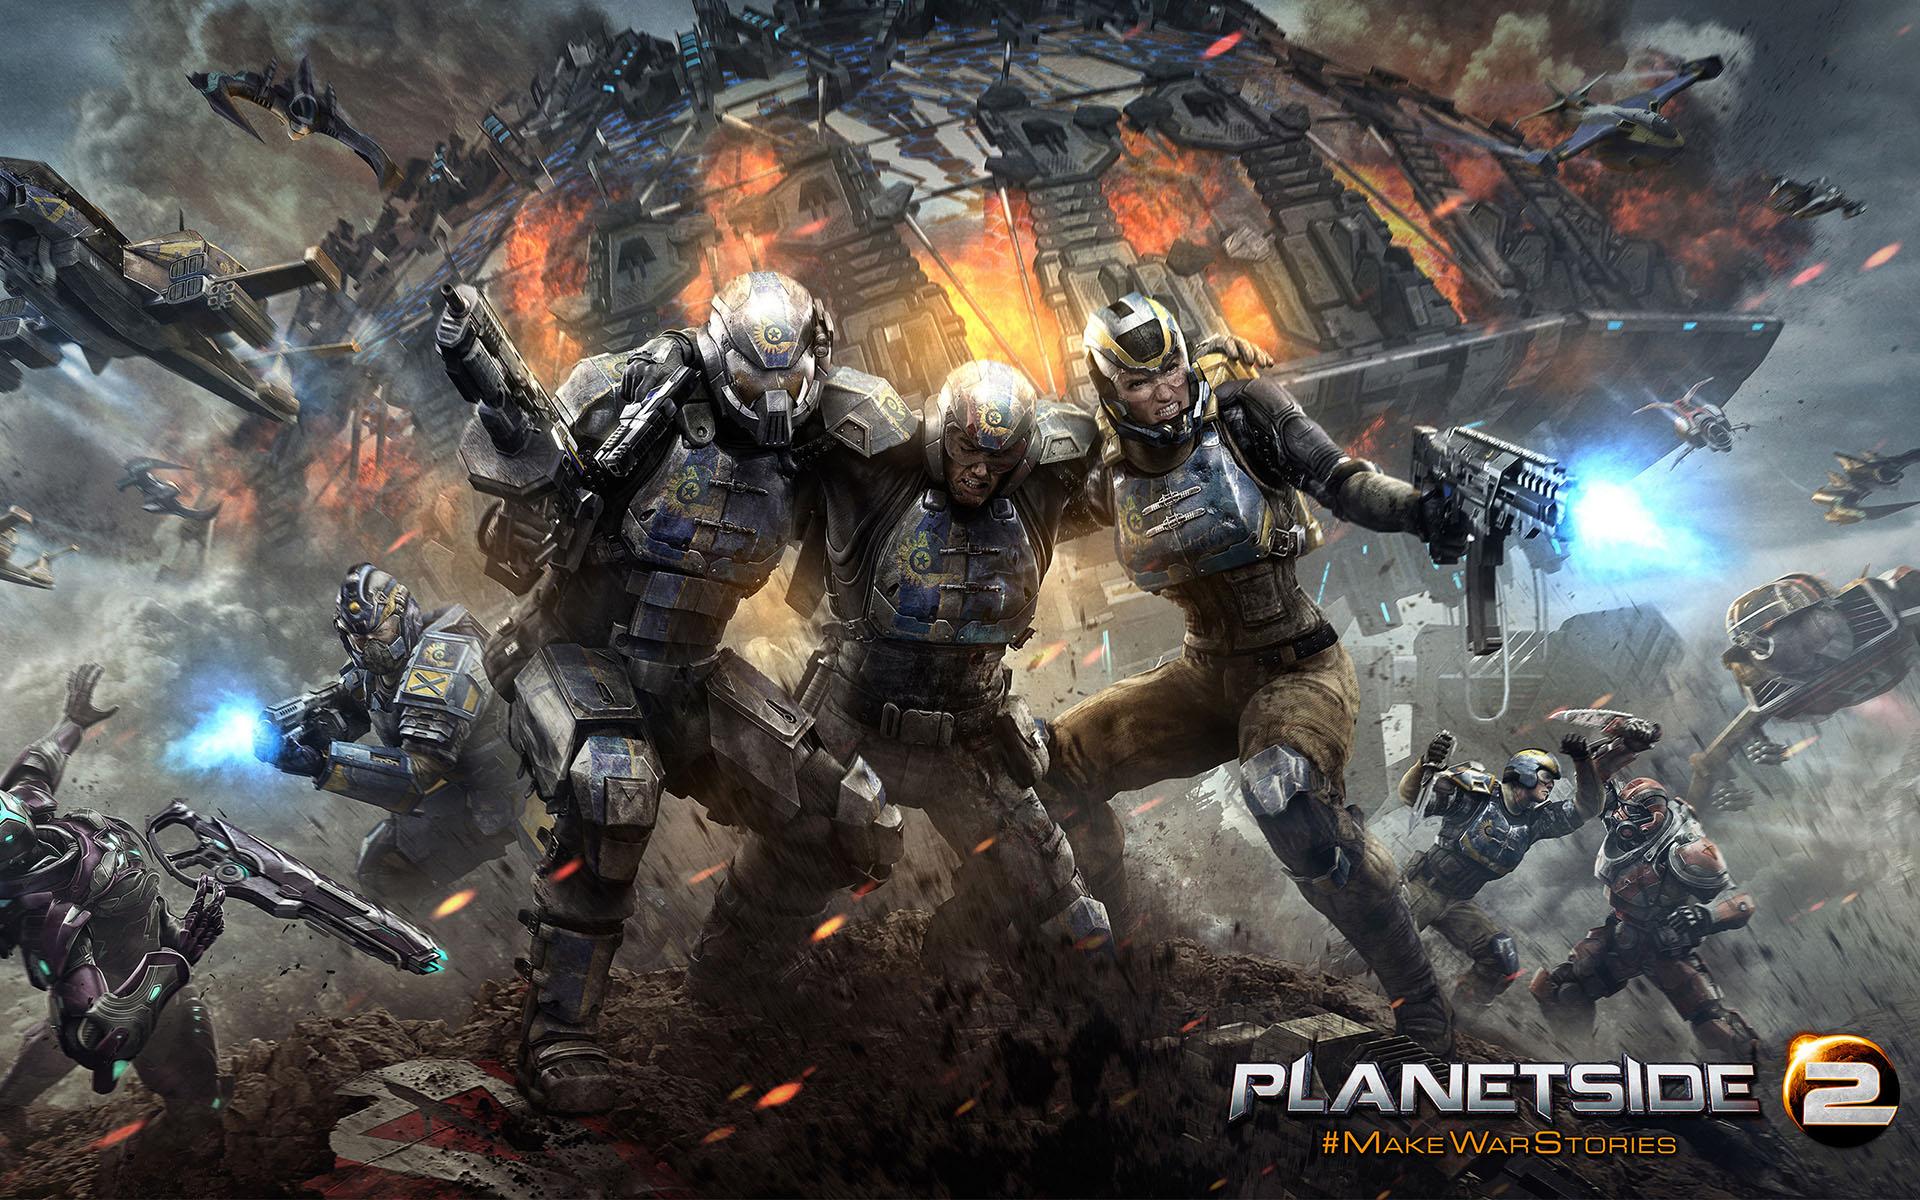 Planetside 2 PS4 Wallpaper 1920x1200